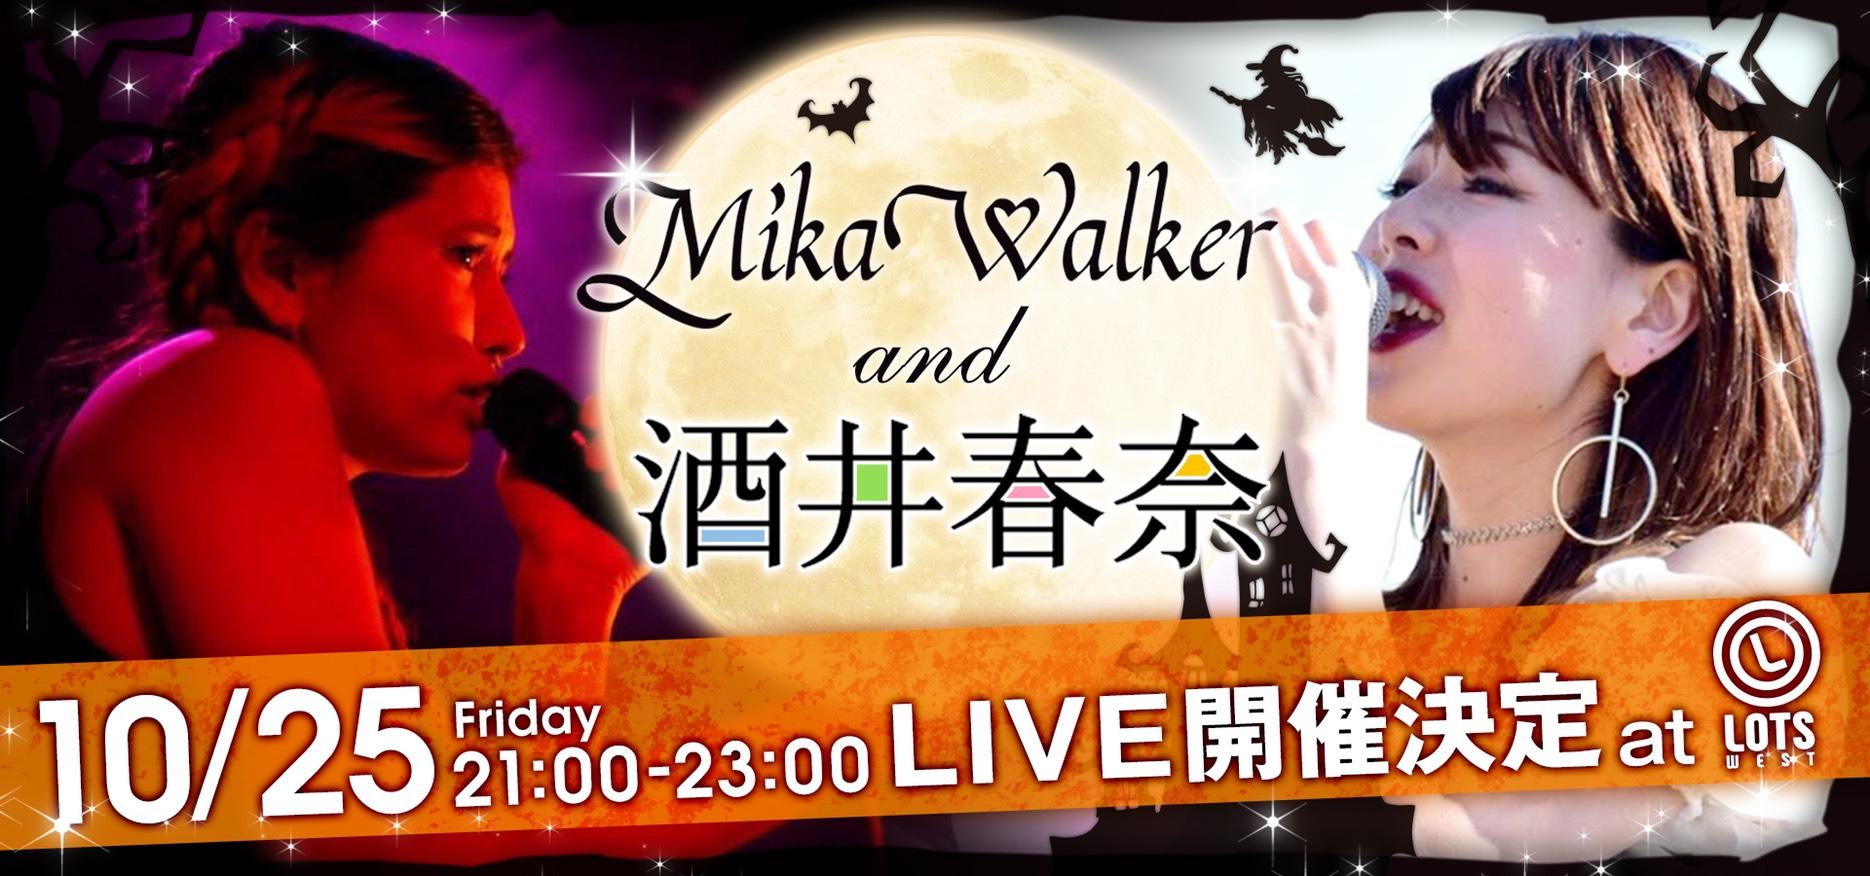 【LIVE告知】MikaWalker and 酒井春奈  ハロウィンLive開催決定‼︎ 10/25(Fri)